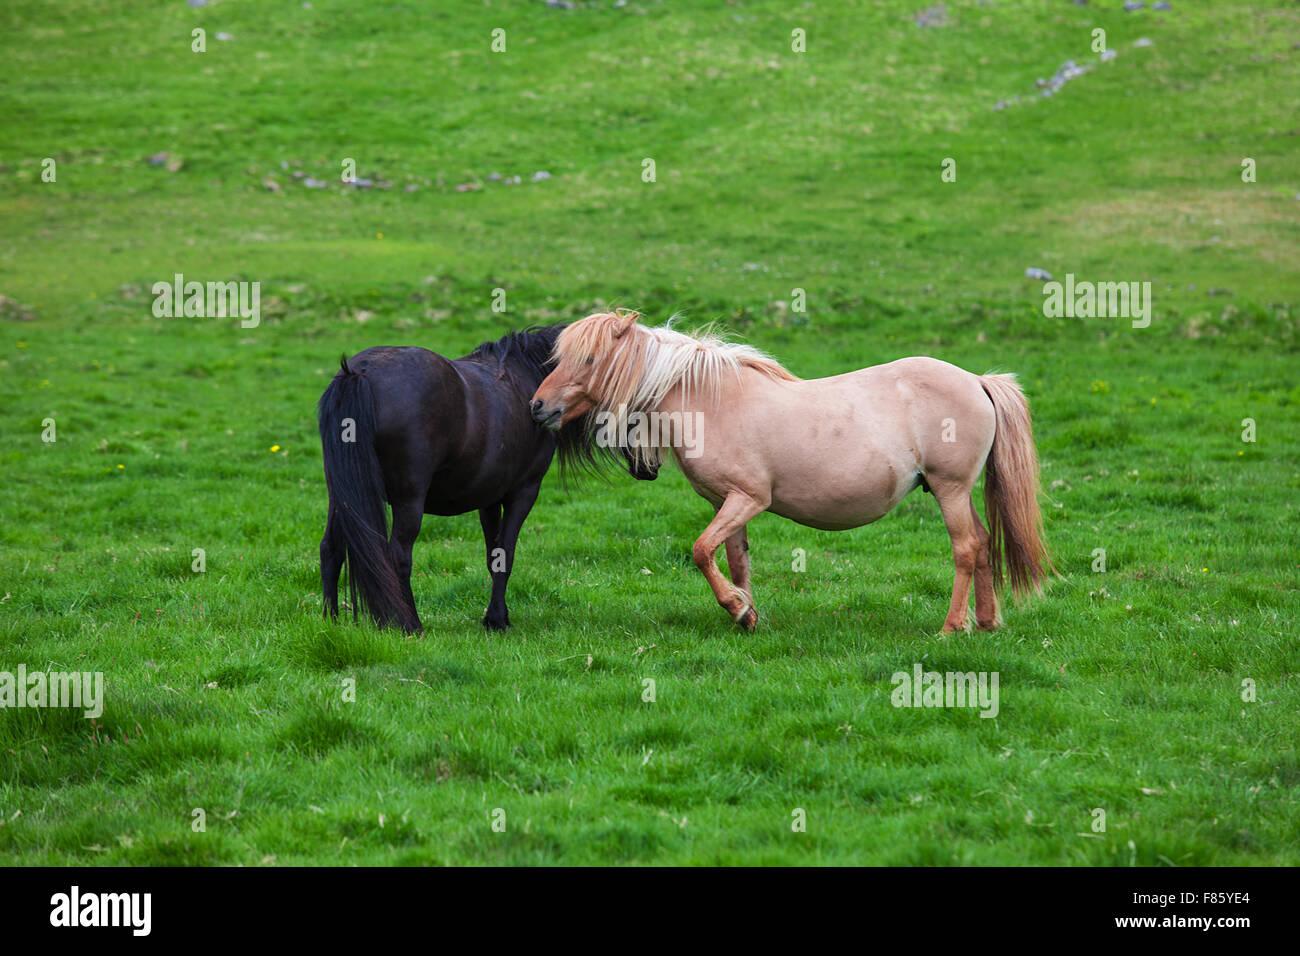 A lovely couple of Icelandic Horses - Stock Image